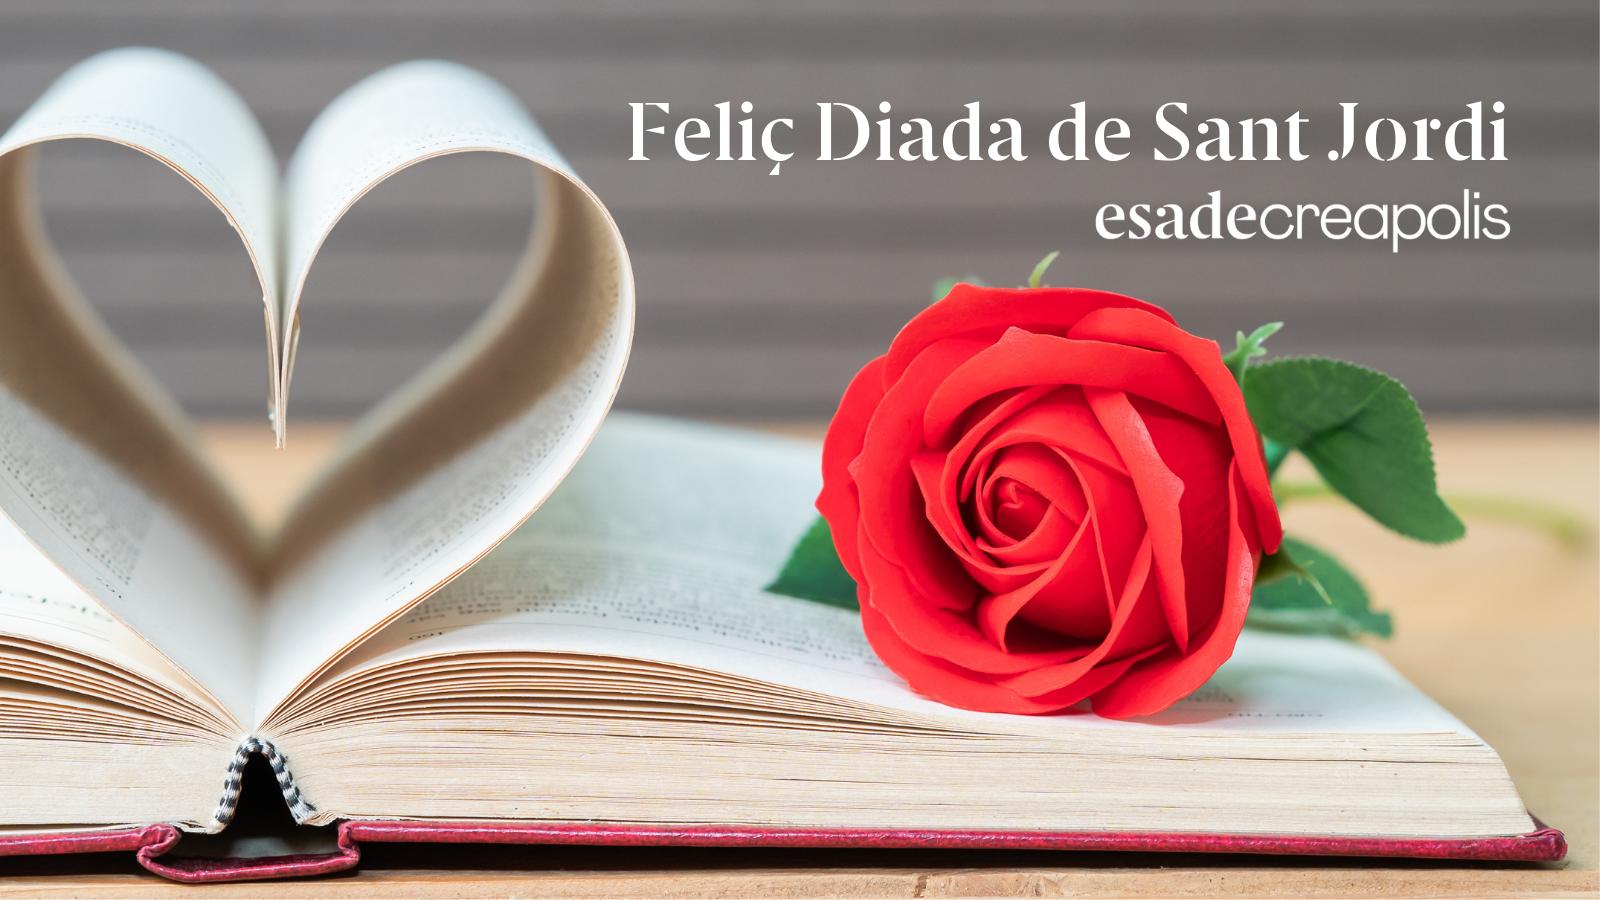 Post Twitter Sant Jordi